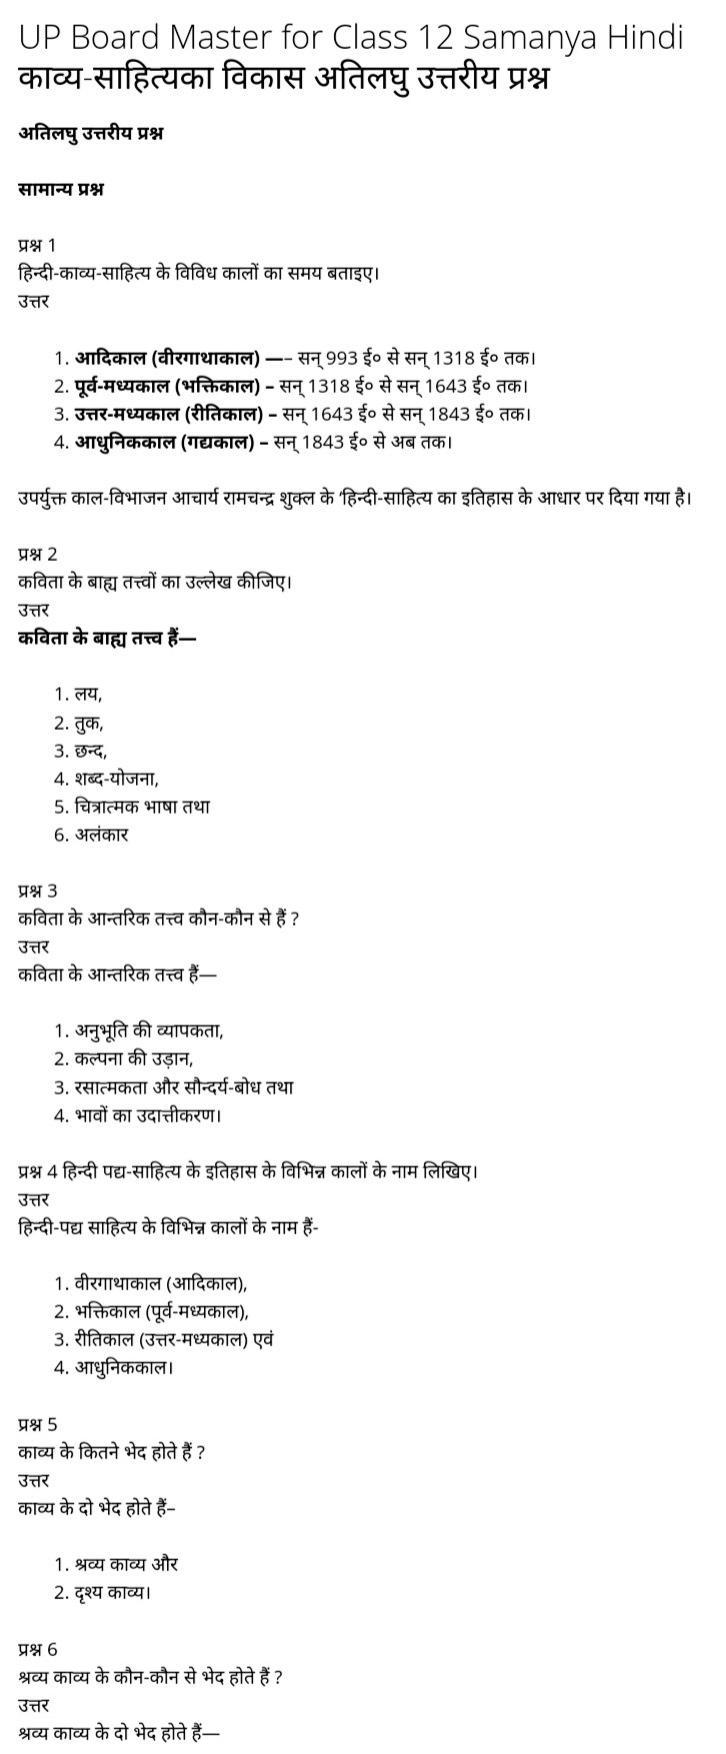 UP Board Solutions for Class 12 Samanya Hindi काव्य-साहित्यका विकास अतिलघु उत्तरीय प्रश्न